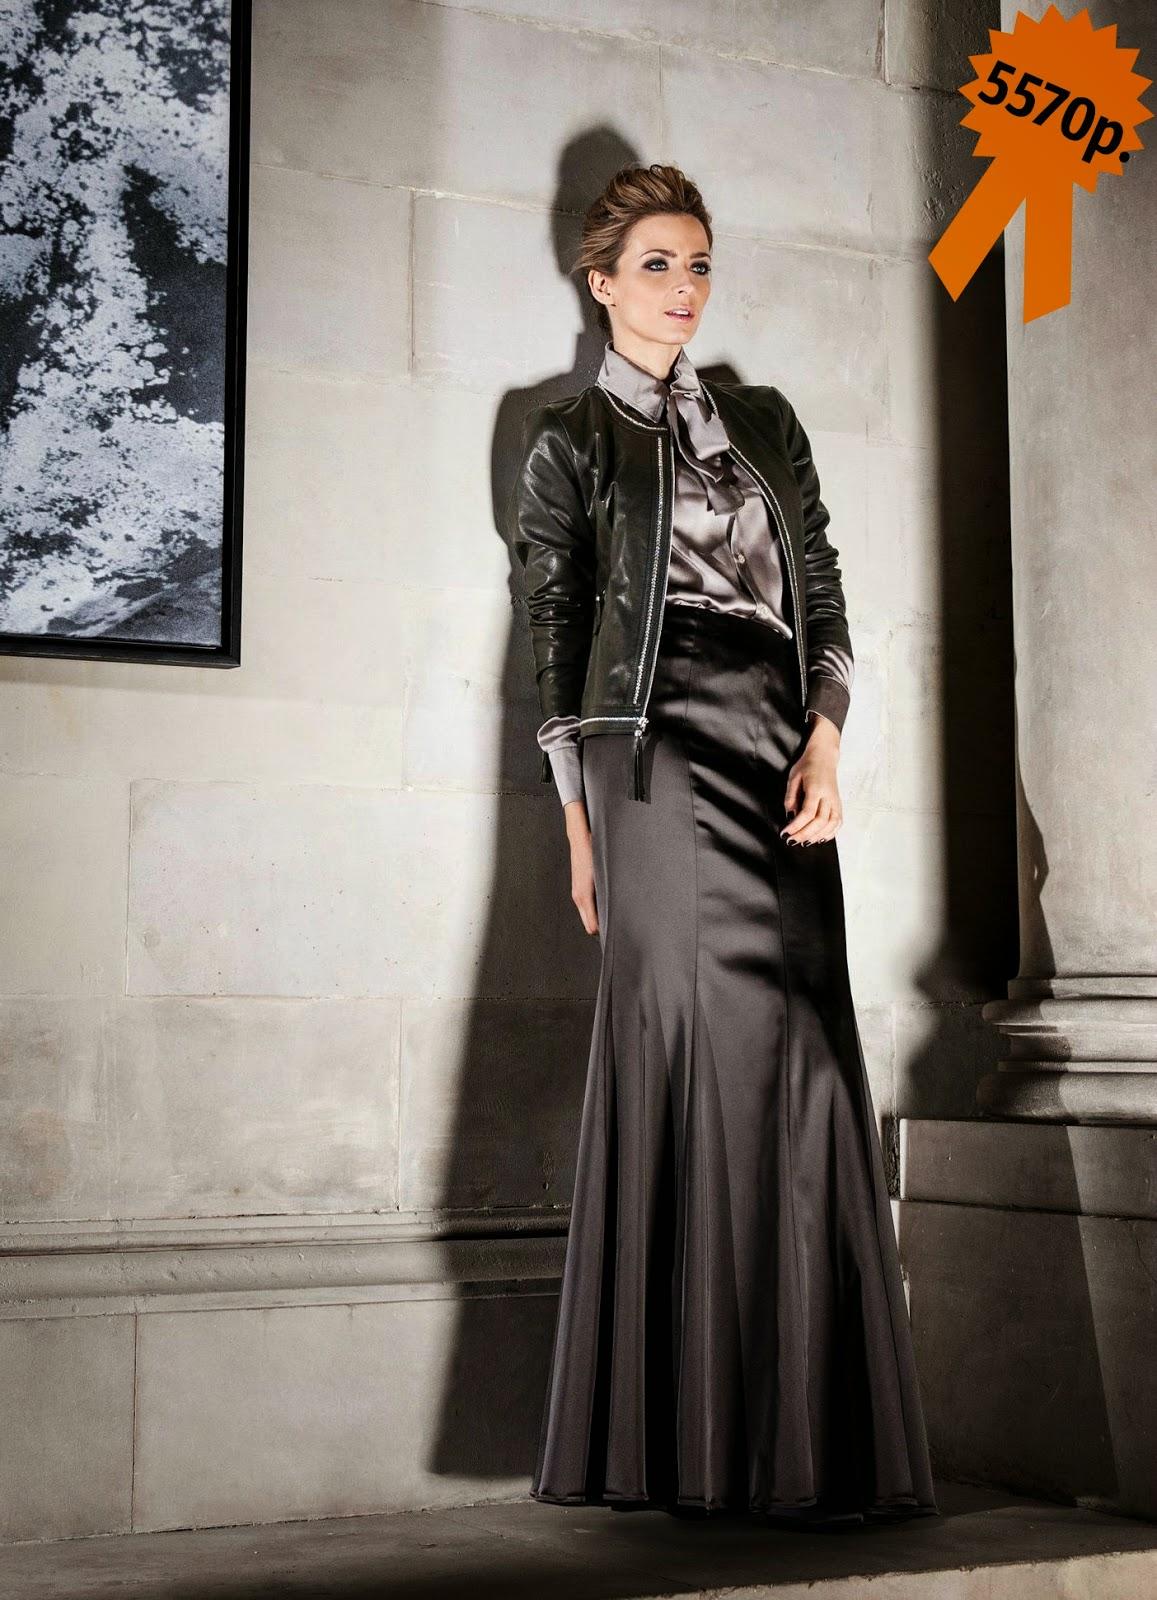 Mакси-юбку Elegance ретро стиль